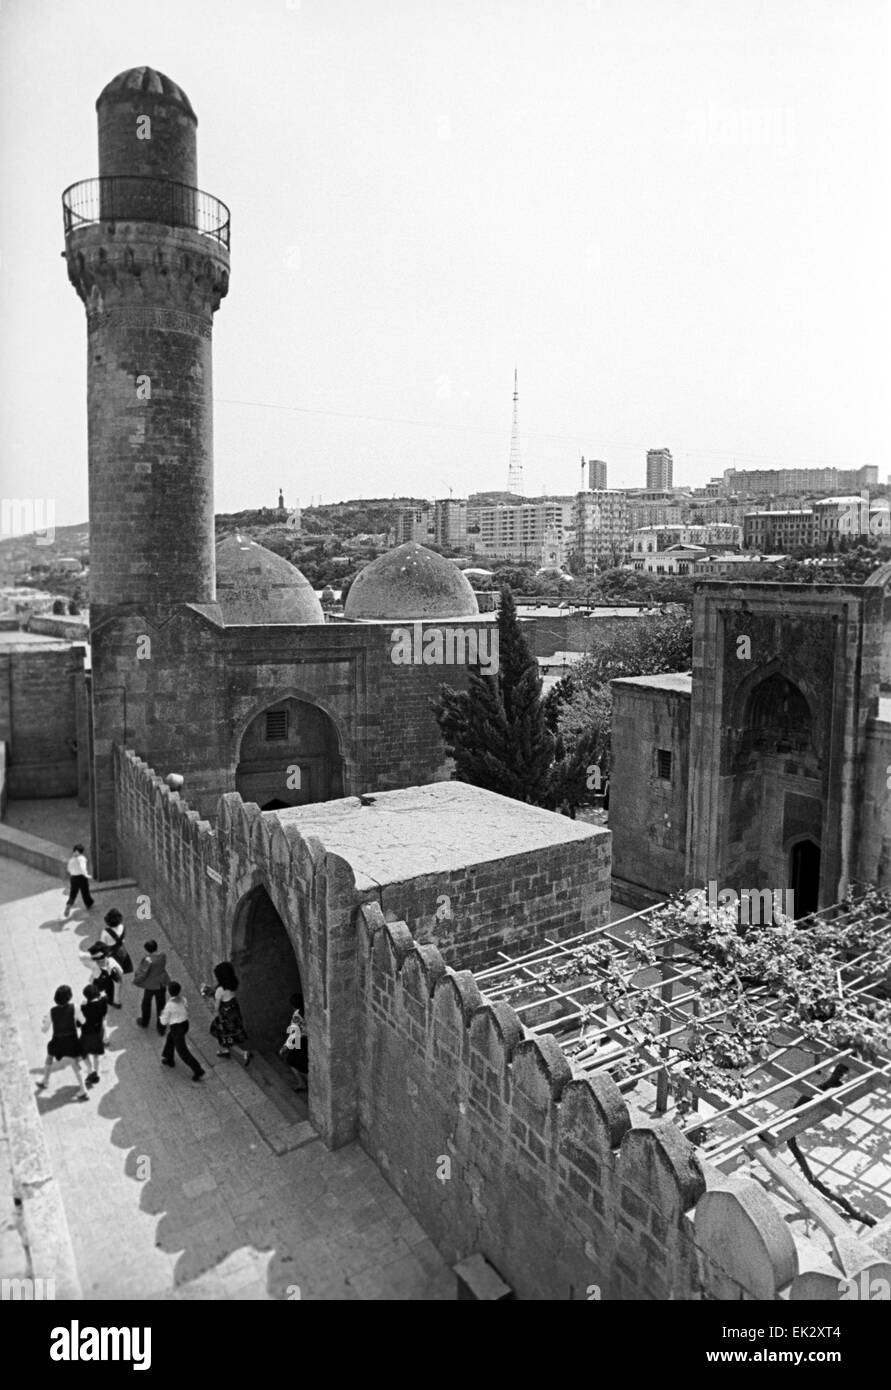 Azerbaijani SSR. Baku. 'Icheri-shekher' fortress in a history part of the city. - Stock Image